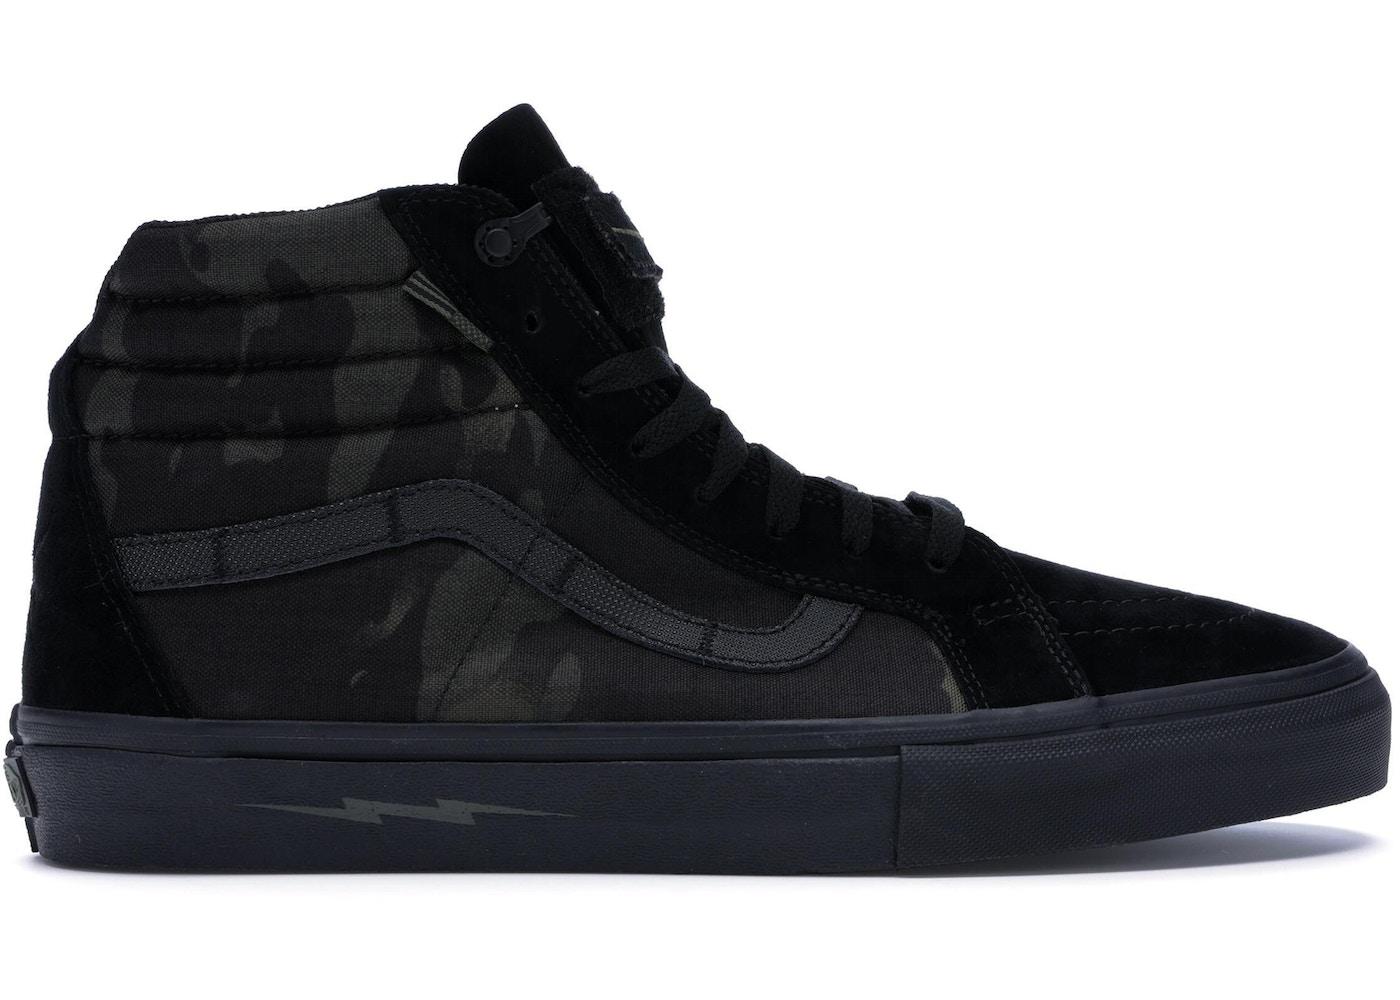 bd4b7551 Footwear - Average Sale Price